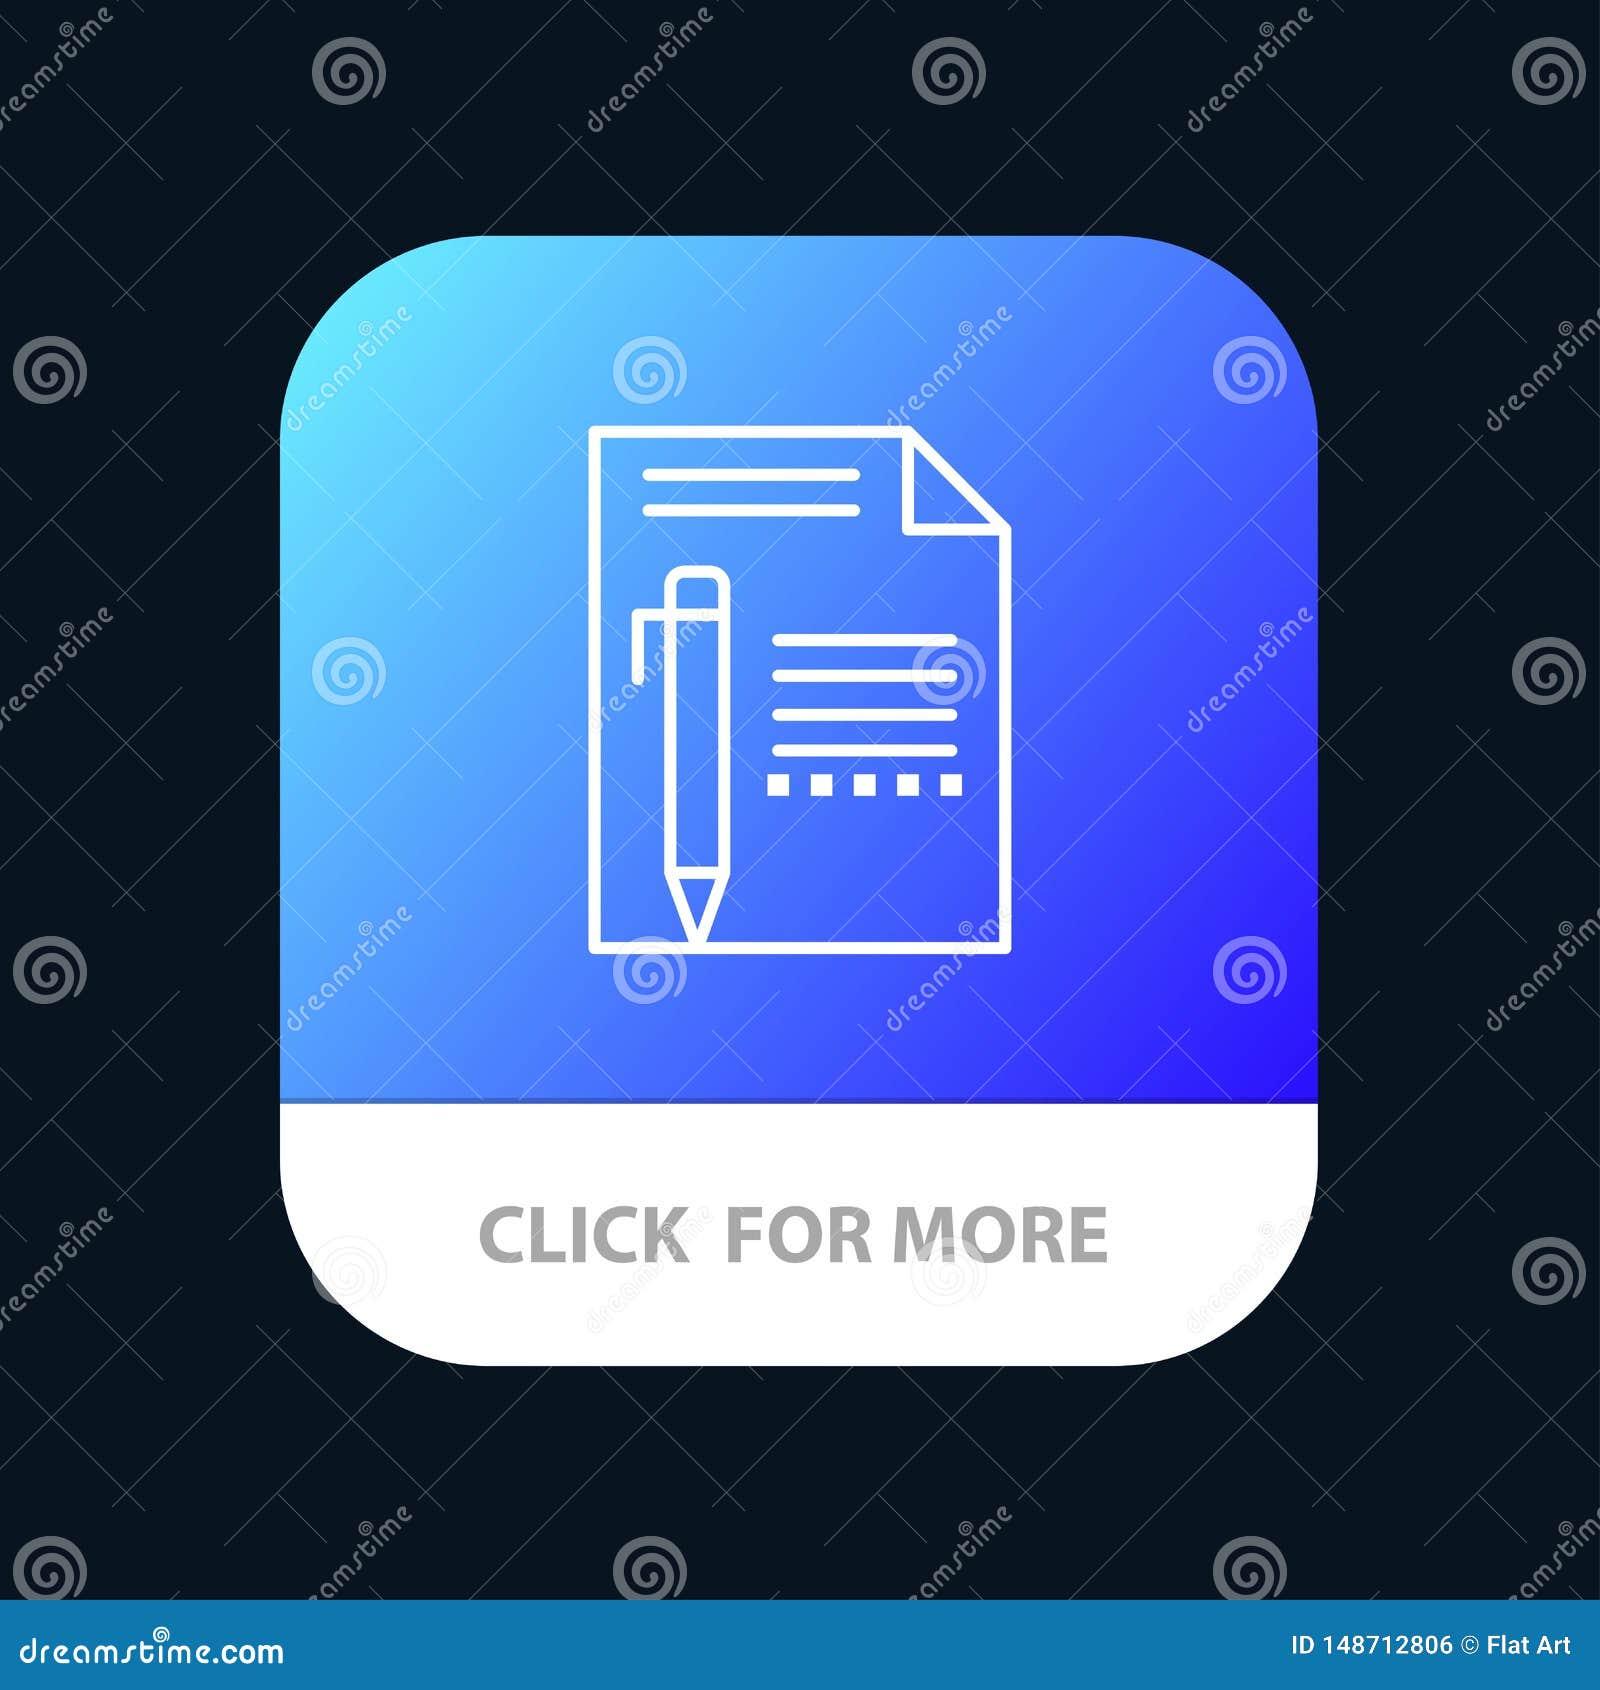 Документируйте, отредактируйте, вызовите, заверните в бумагу, рисуйте, напишите мобильную кнопку приложения Андроид и линия верси